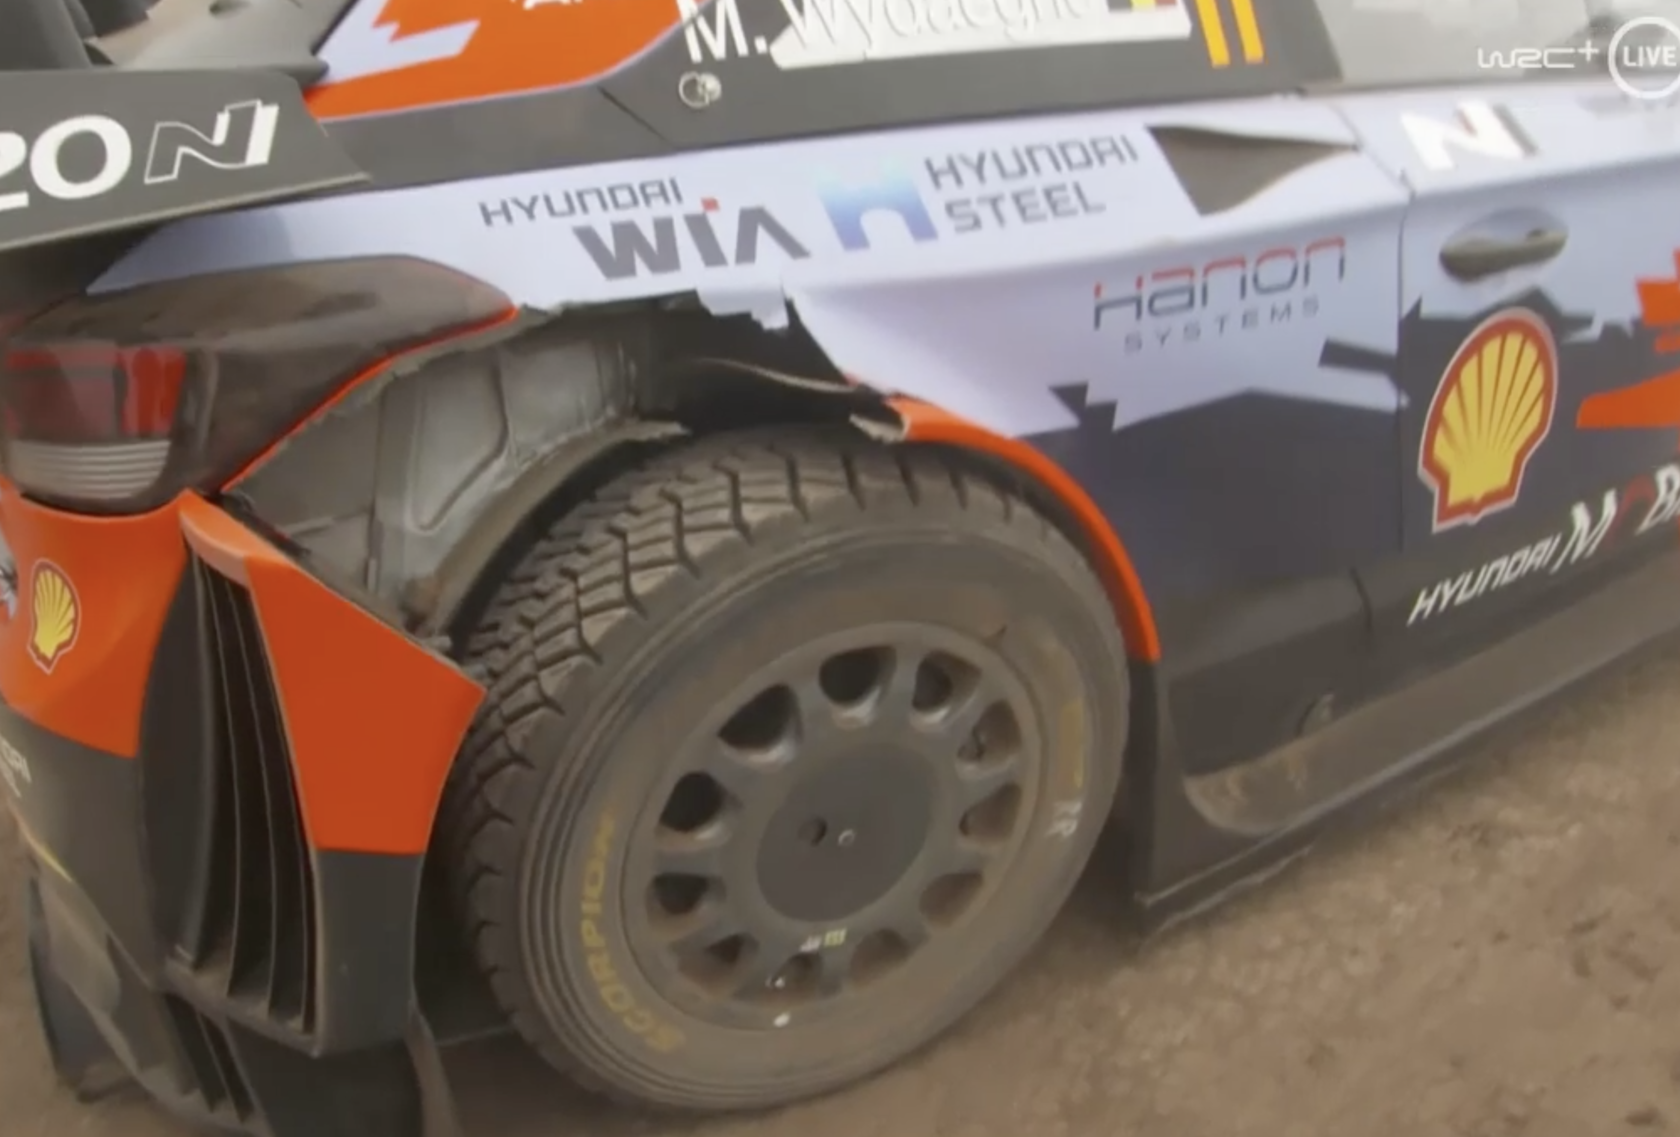 Hyundai i20 Coupe WRC Тьерри Невилля на финише СУ14, ралли Сафари 2021